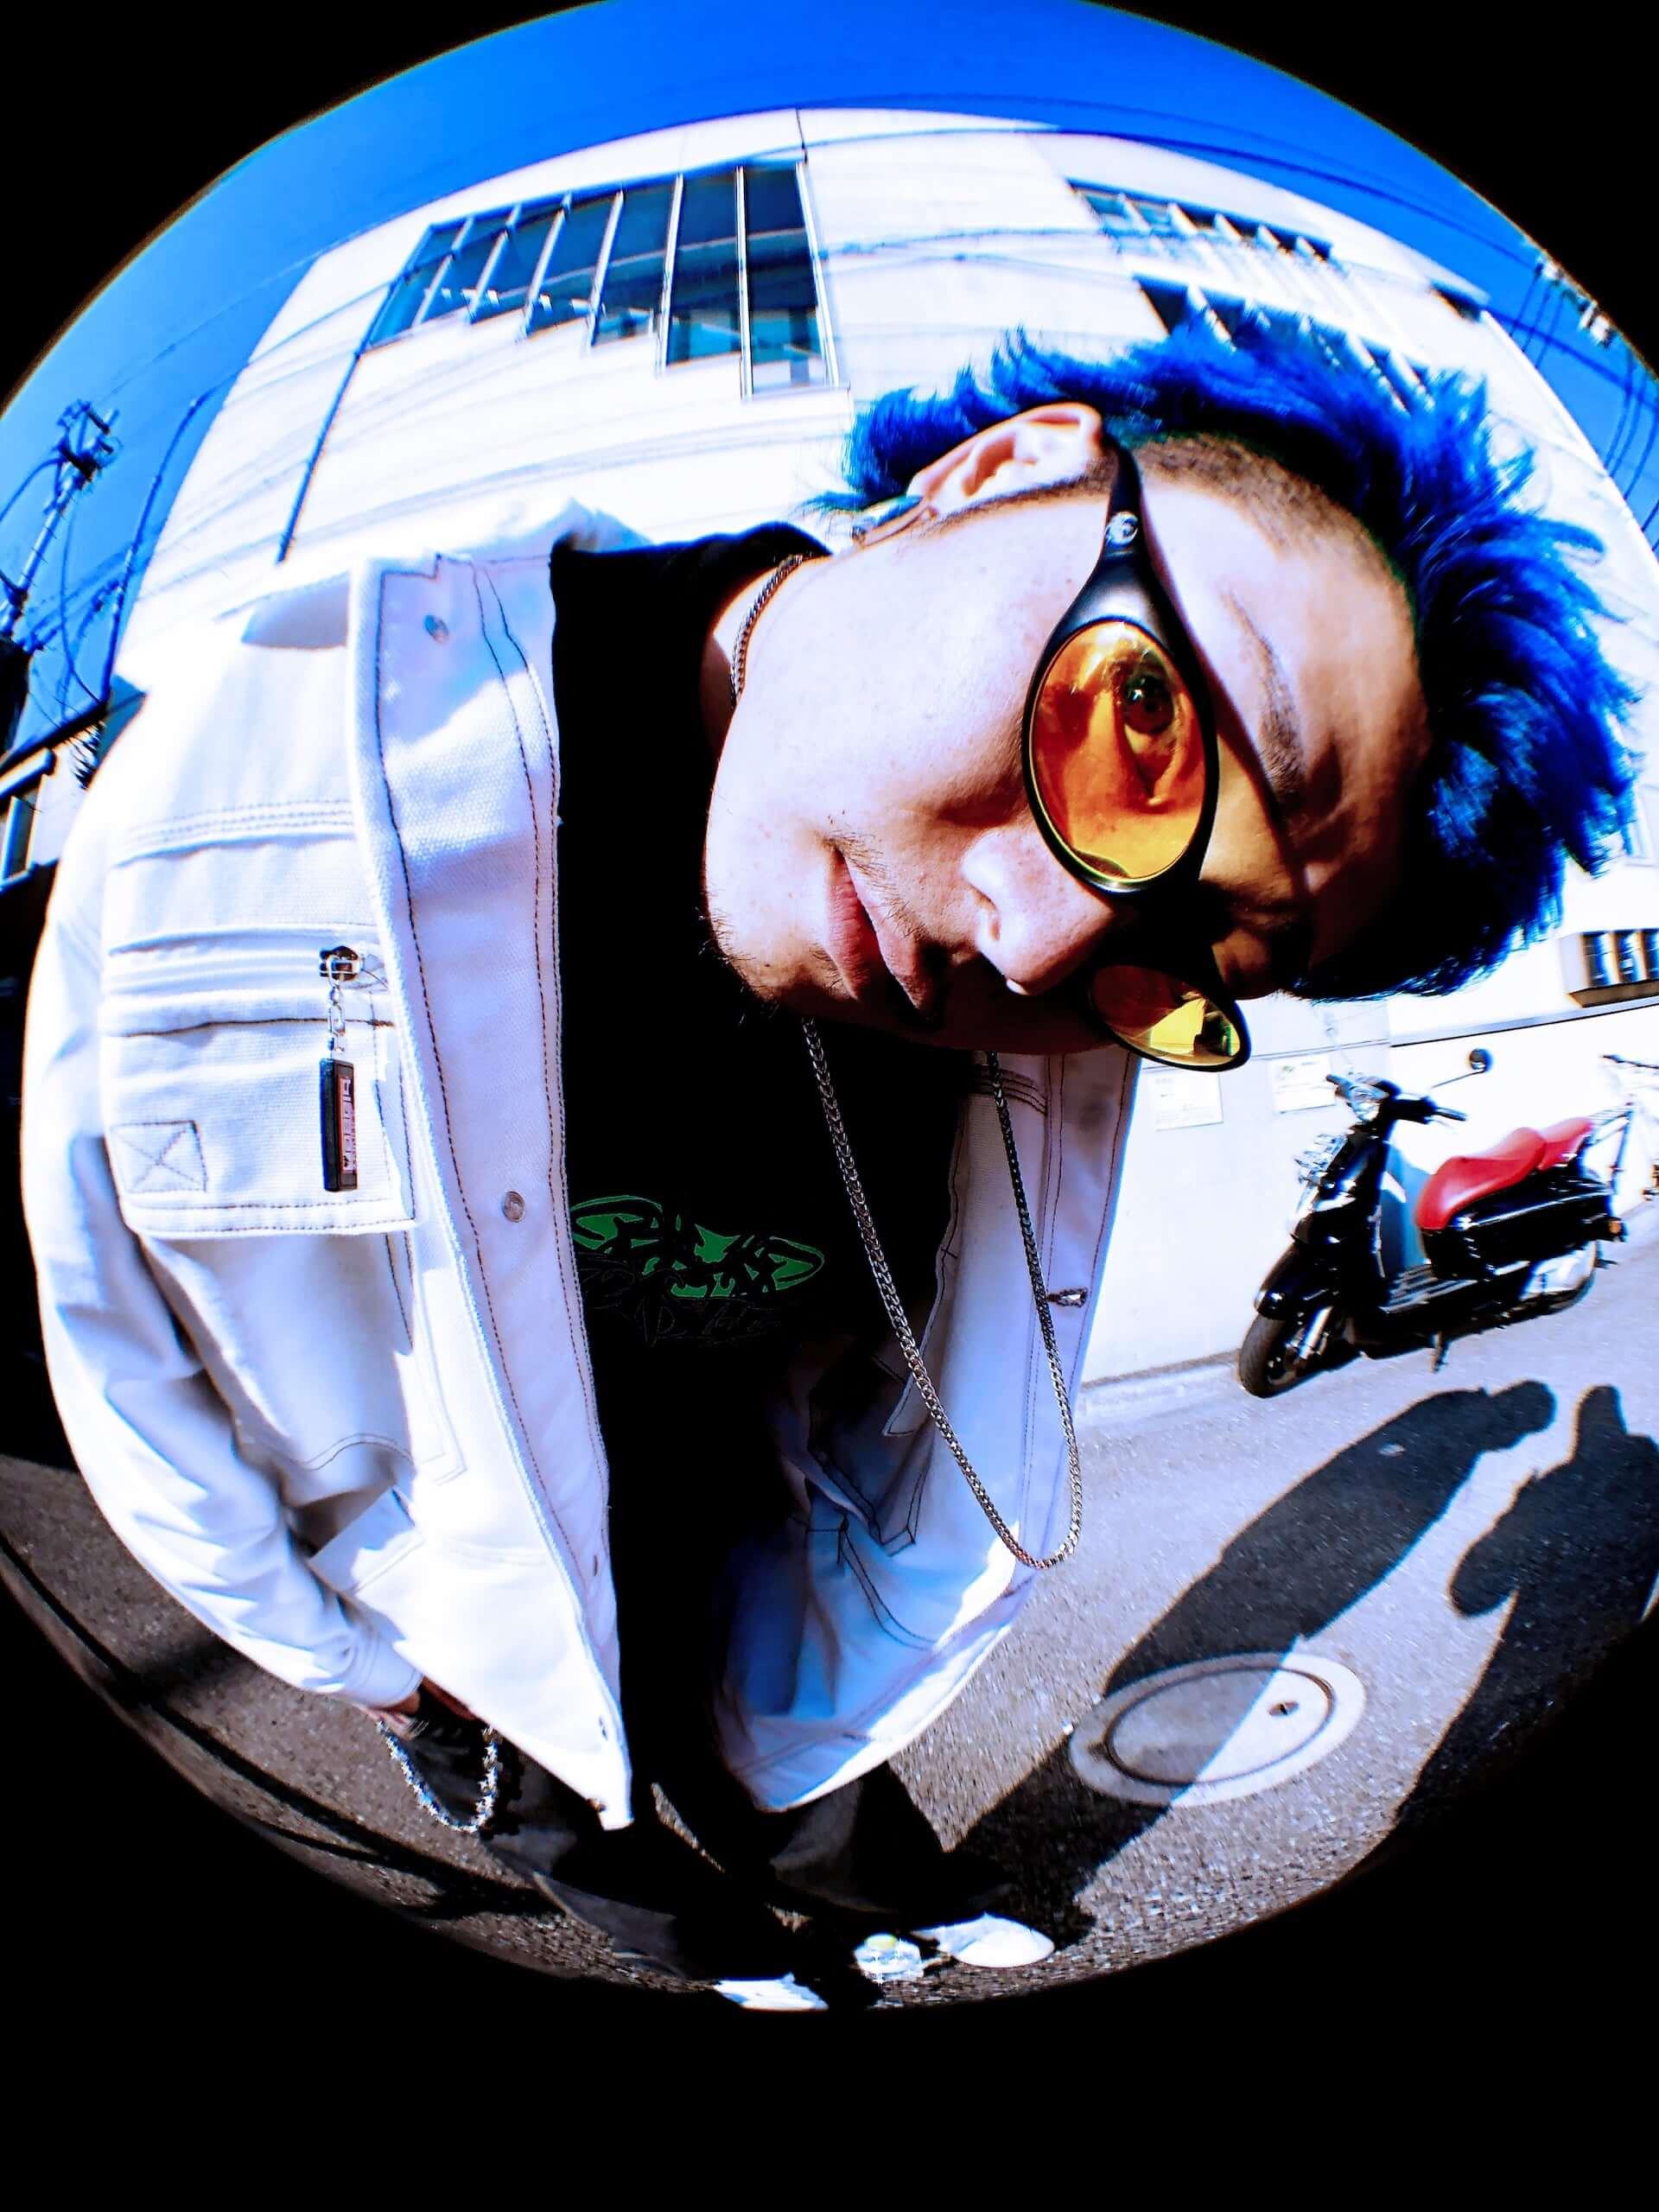 Creative Drug StoreのJUBEEが新EP『Mass Infection 2』をリリース!GUCCIMAZEがアートワークを担当 music200417_-jubee_2-1920x2560